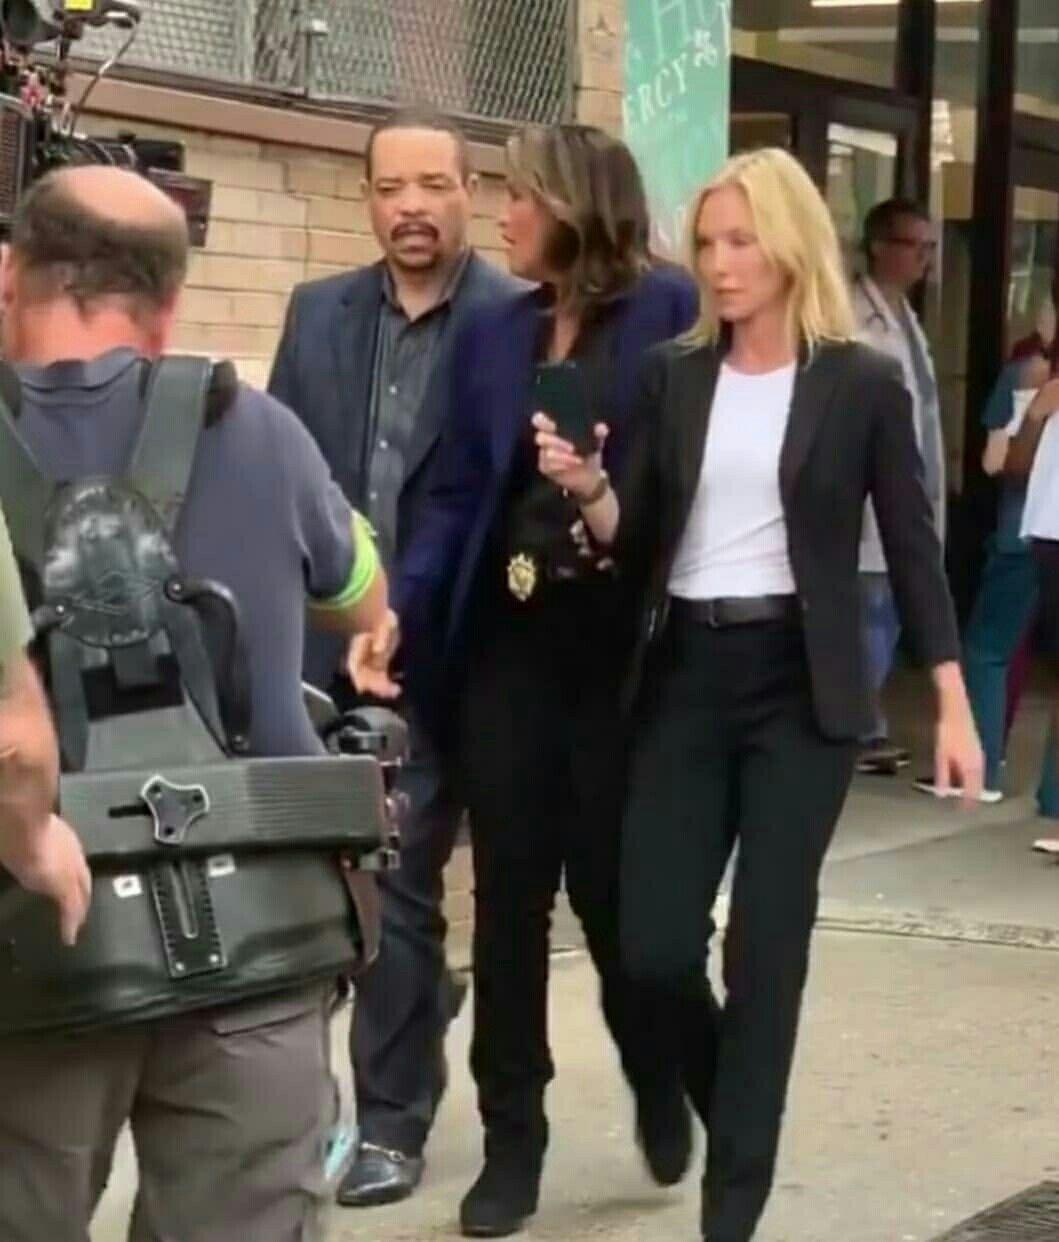 Mariska Hargitay Ice T Kelli Giddish Filming Law Order Svu Season 21 Law And Order Special Victims Unit Mariska Hargitay Law And Order Svu